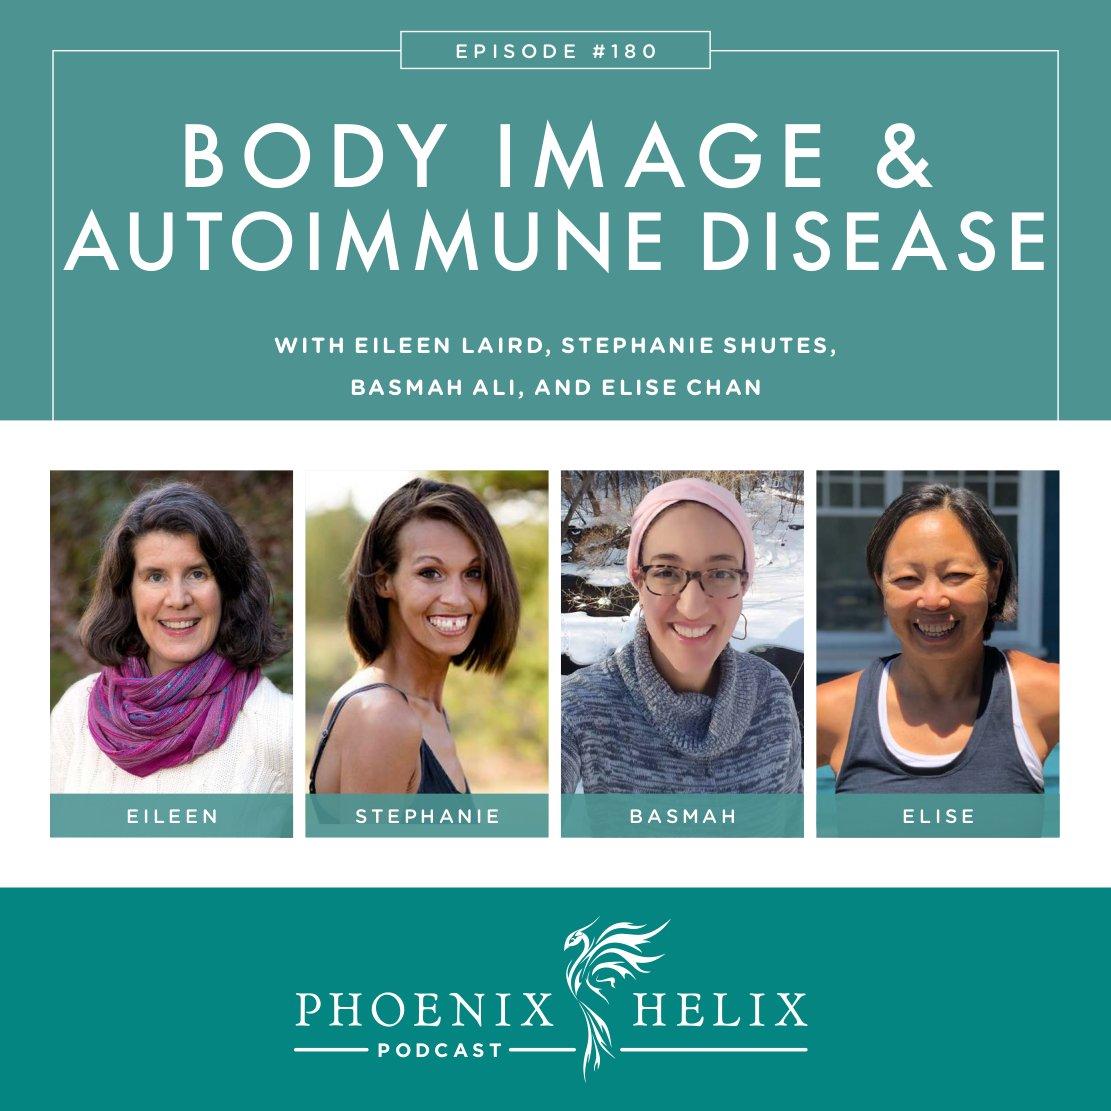 Body Image and Autoimmune Disease | Phoenix Helix Podcast